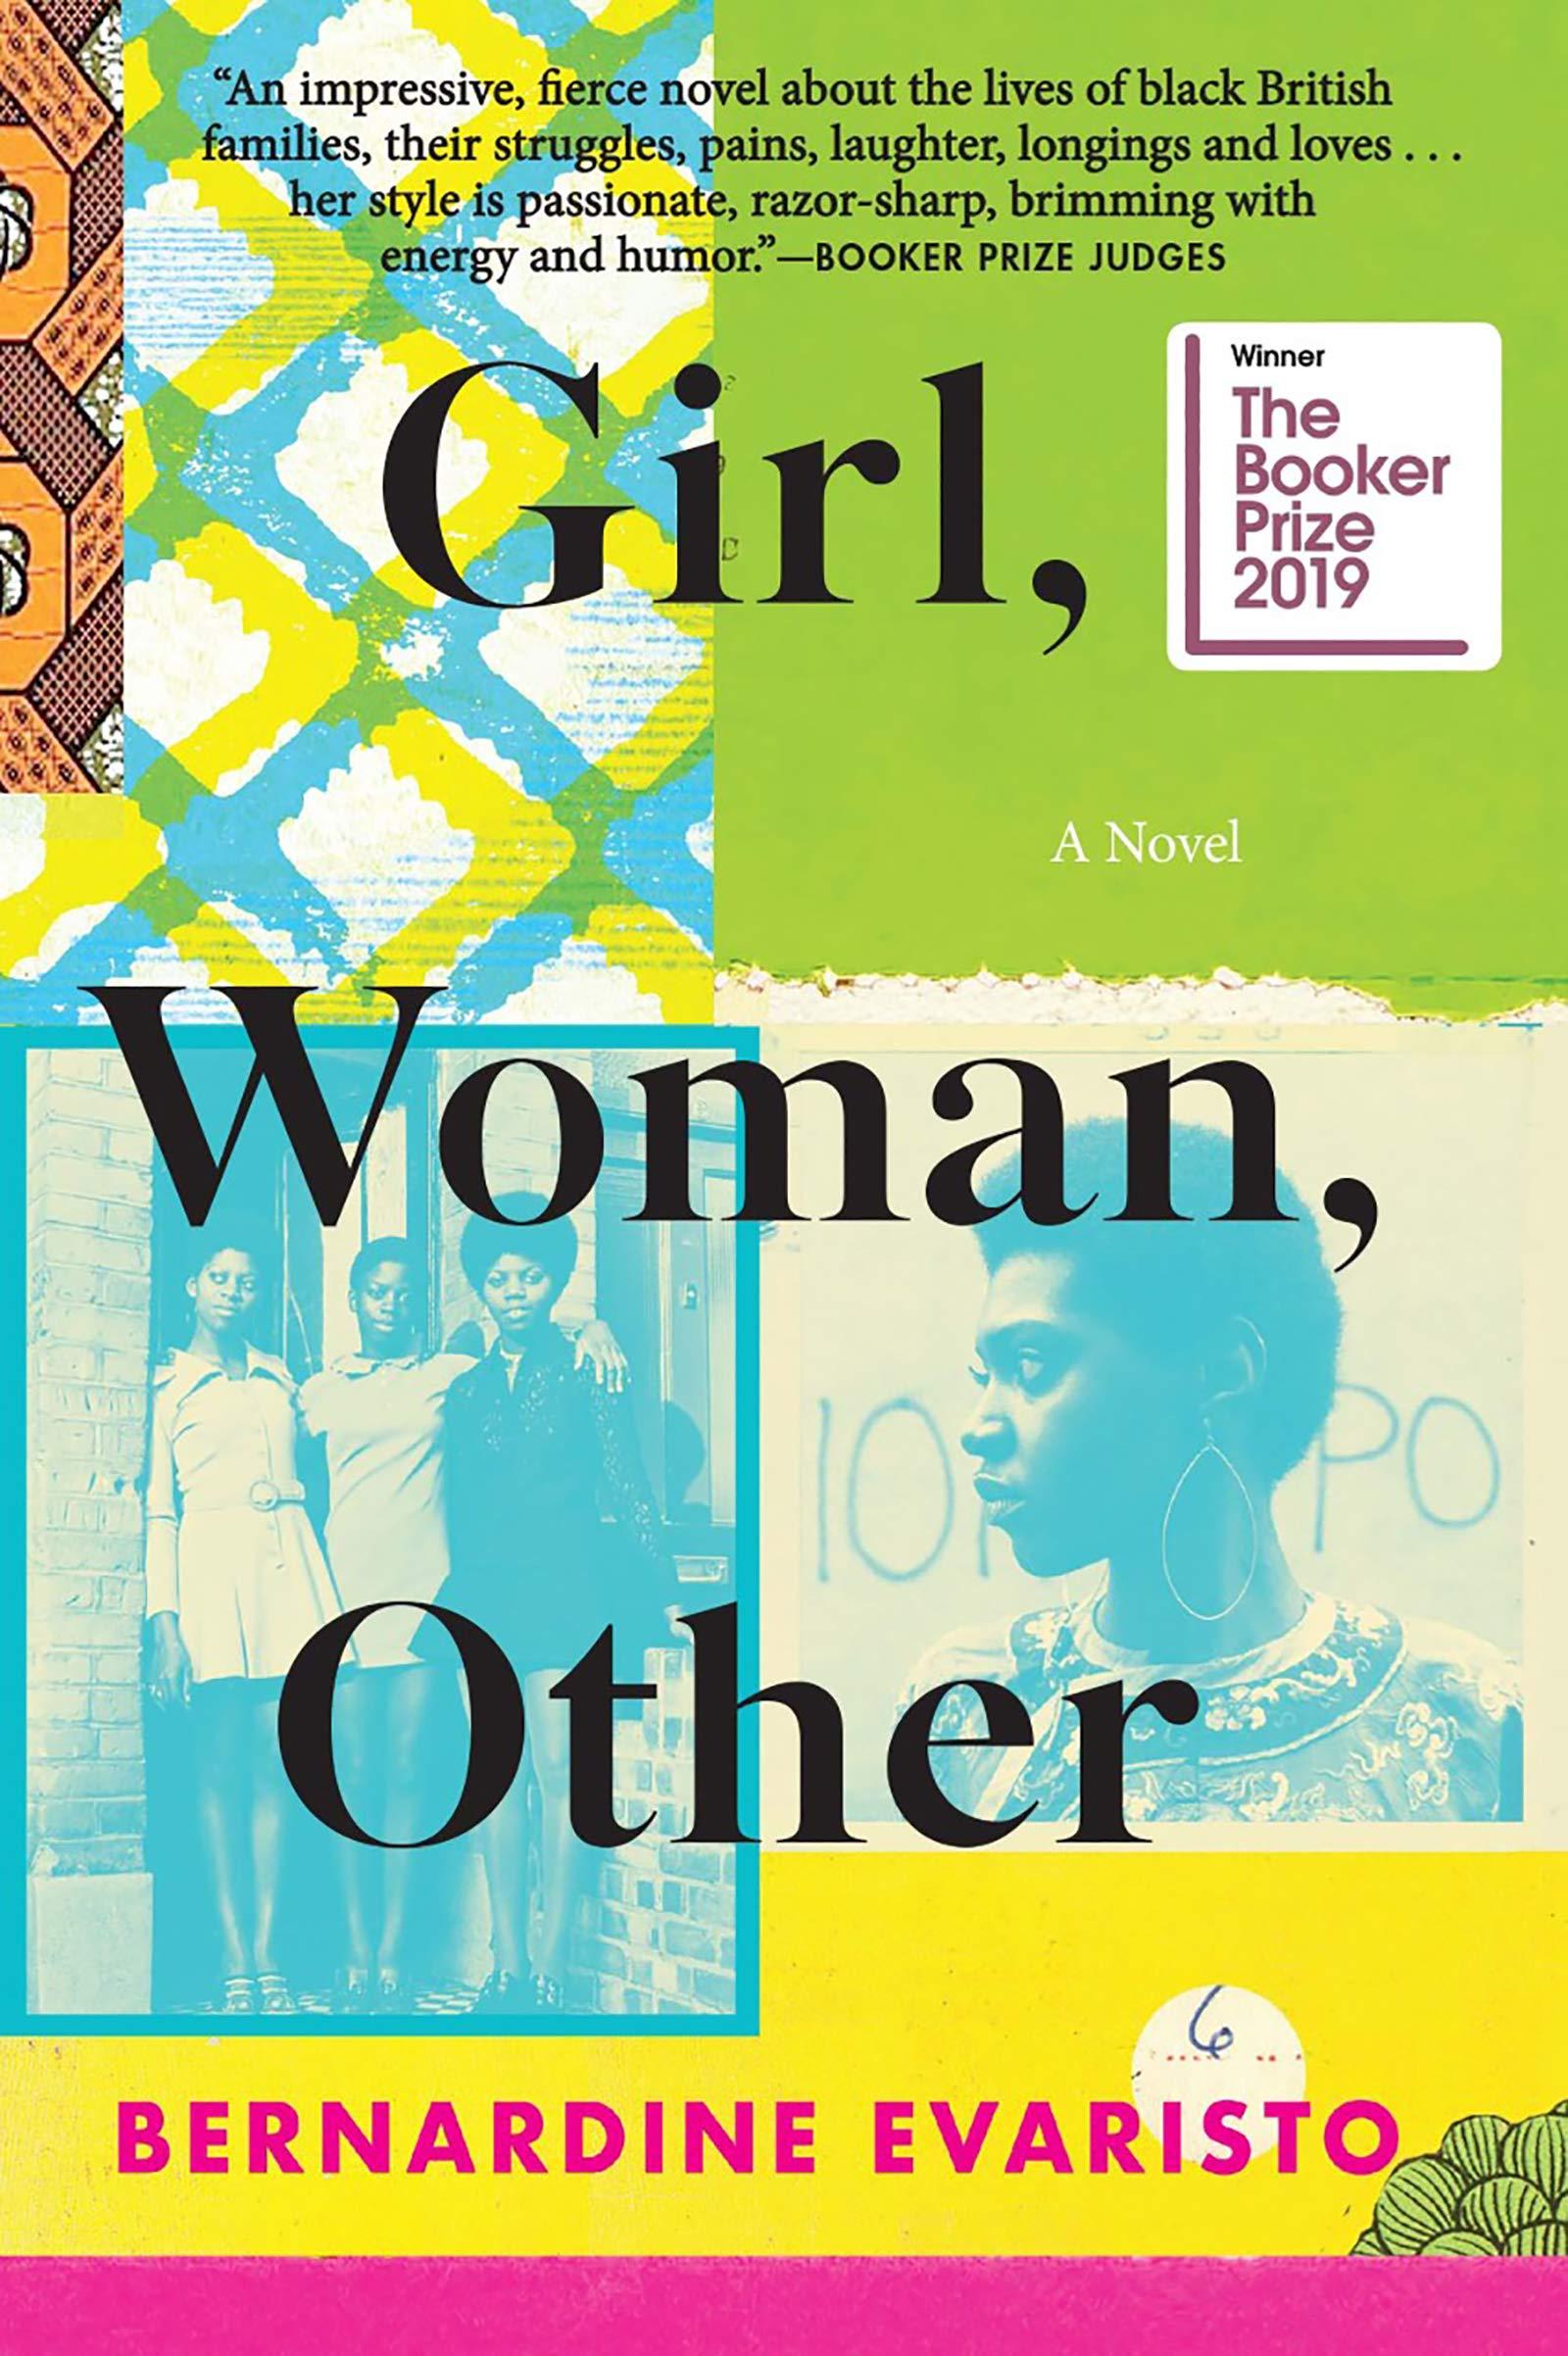 Amazon.com: Girl, Woman, Other: A Novel (Booker Prize Winner)  (9780802156983): Evaristo, Bernardine: Books